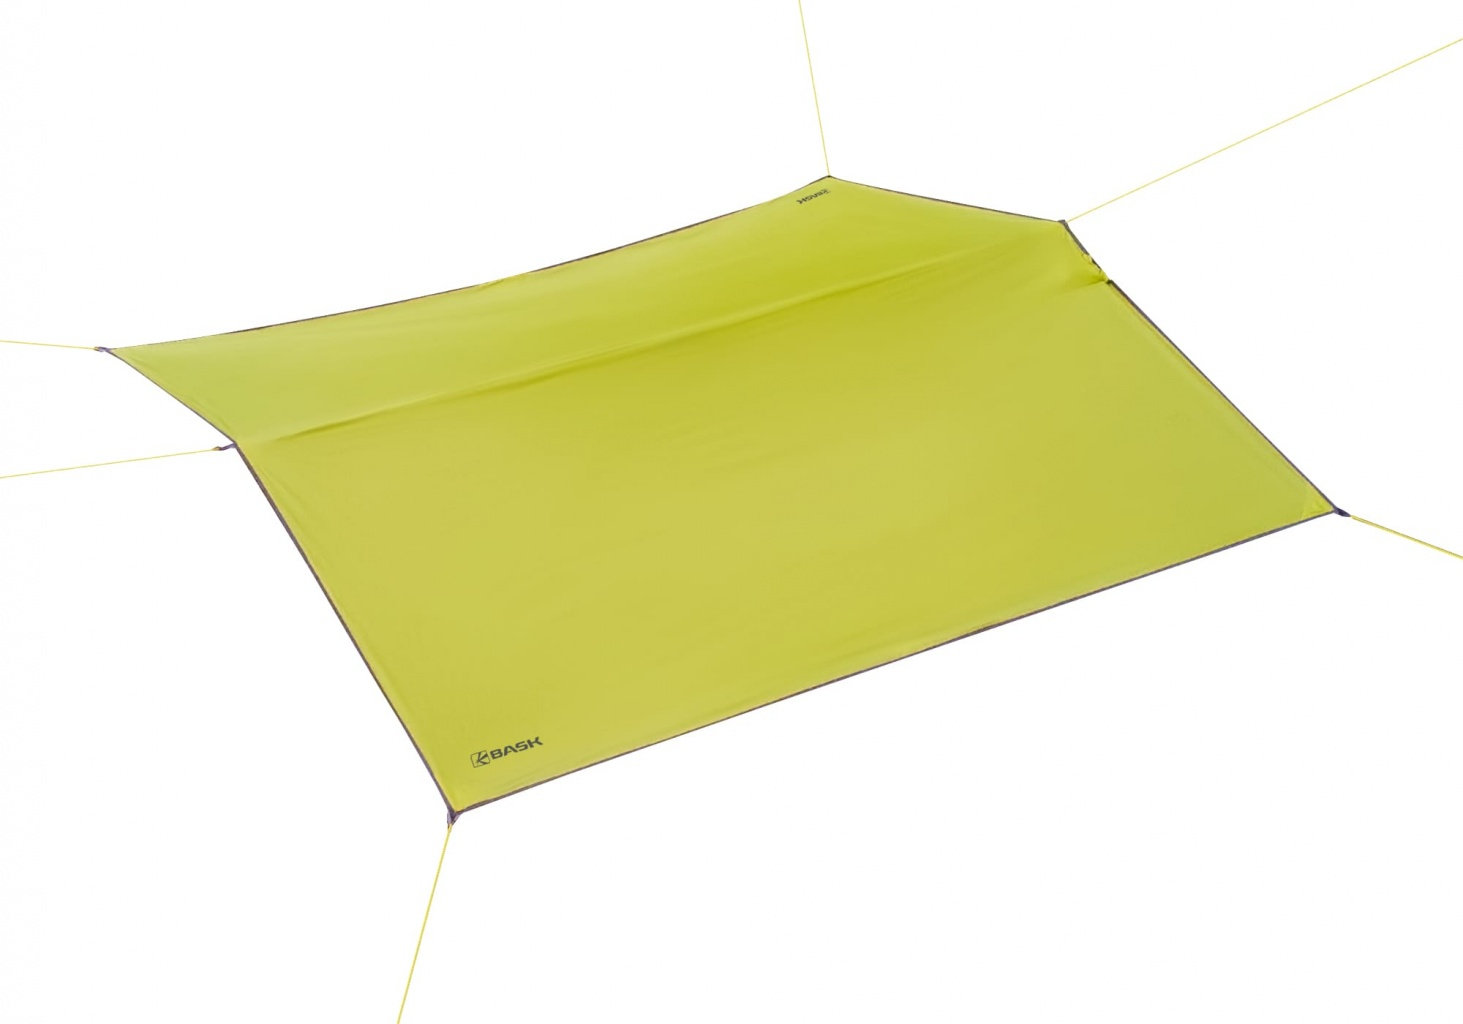 Тент Bask Canopy Silicone зеленый 4,5 x 3 м